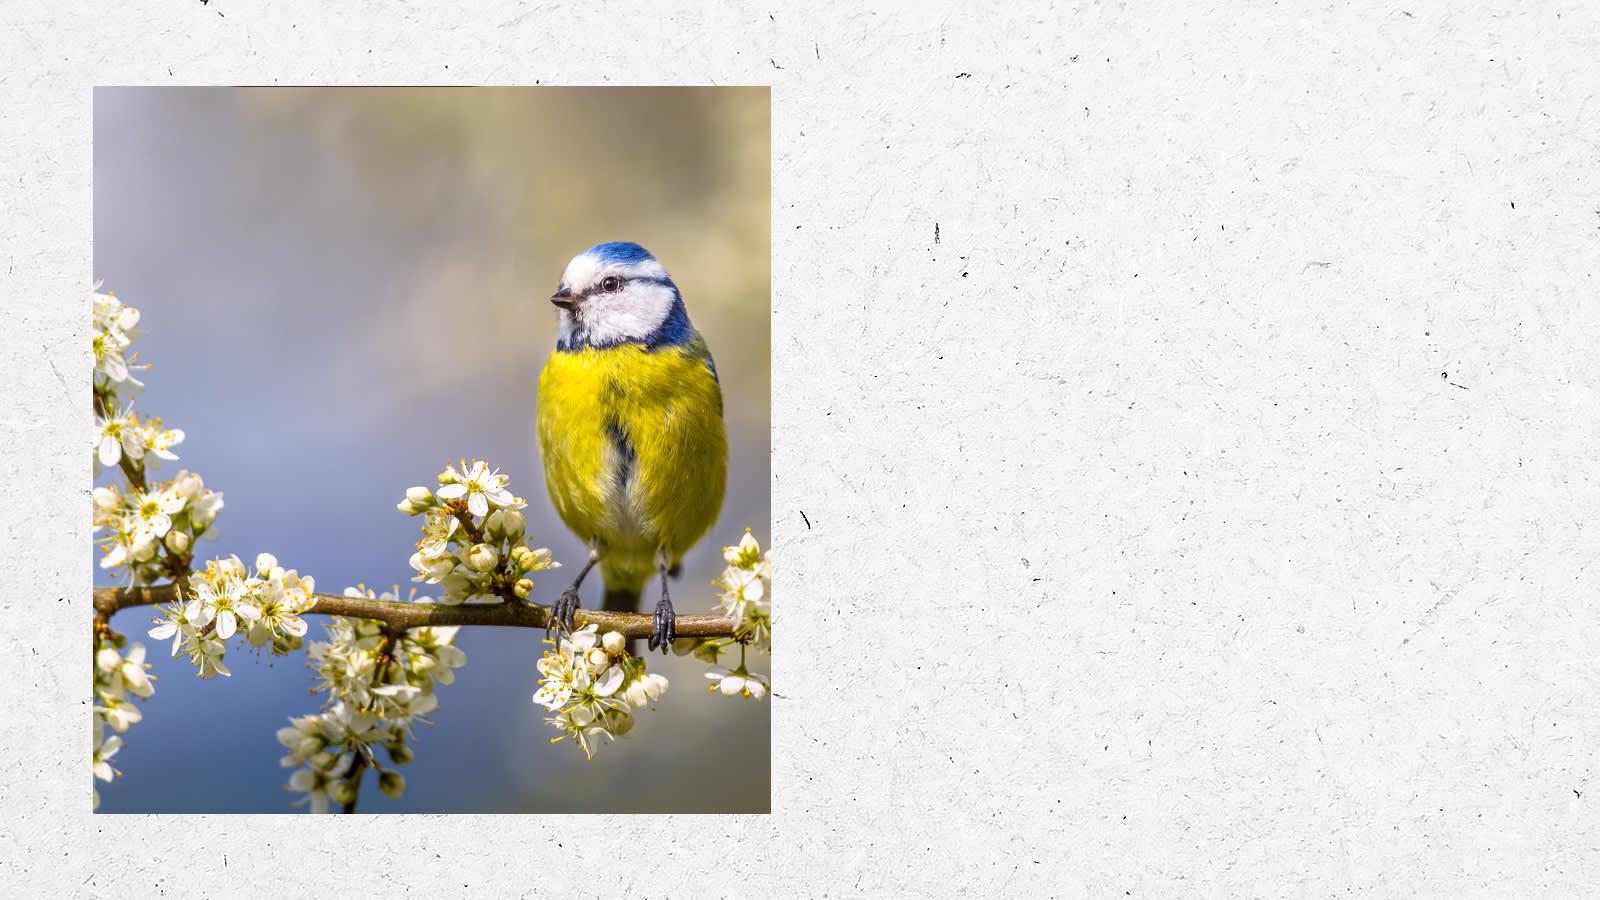 Blue tit sitting on a branch